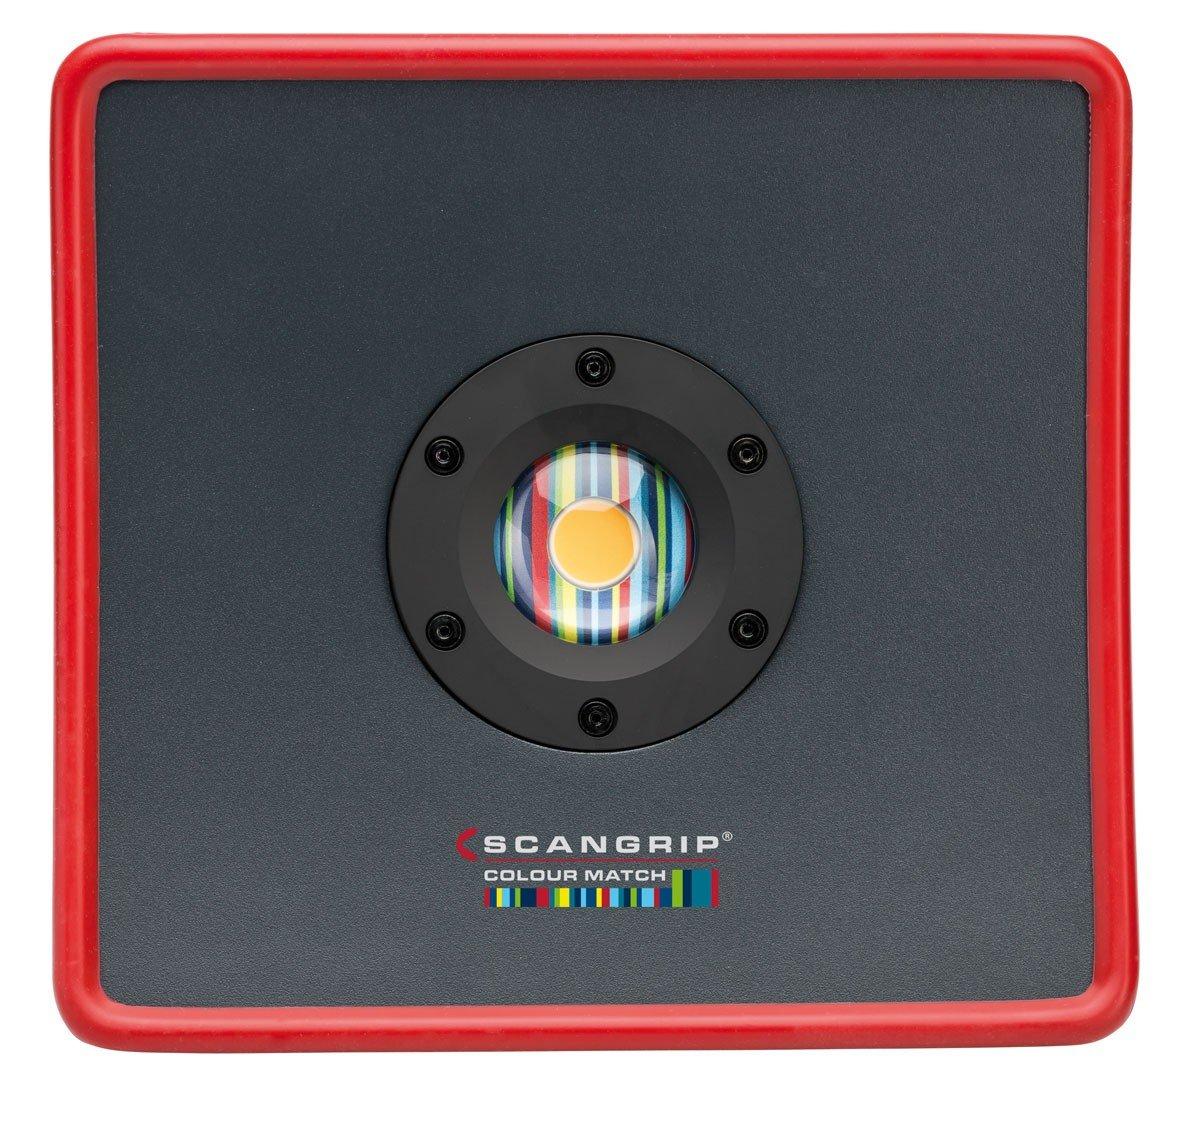 Scangrip Multimatch LED Color-Match Light